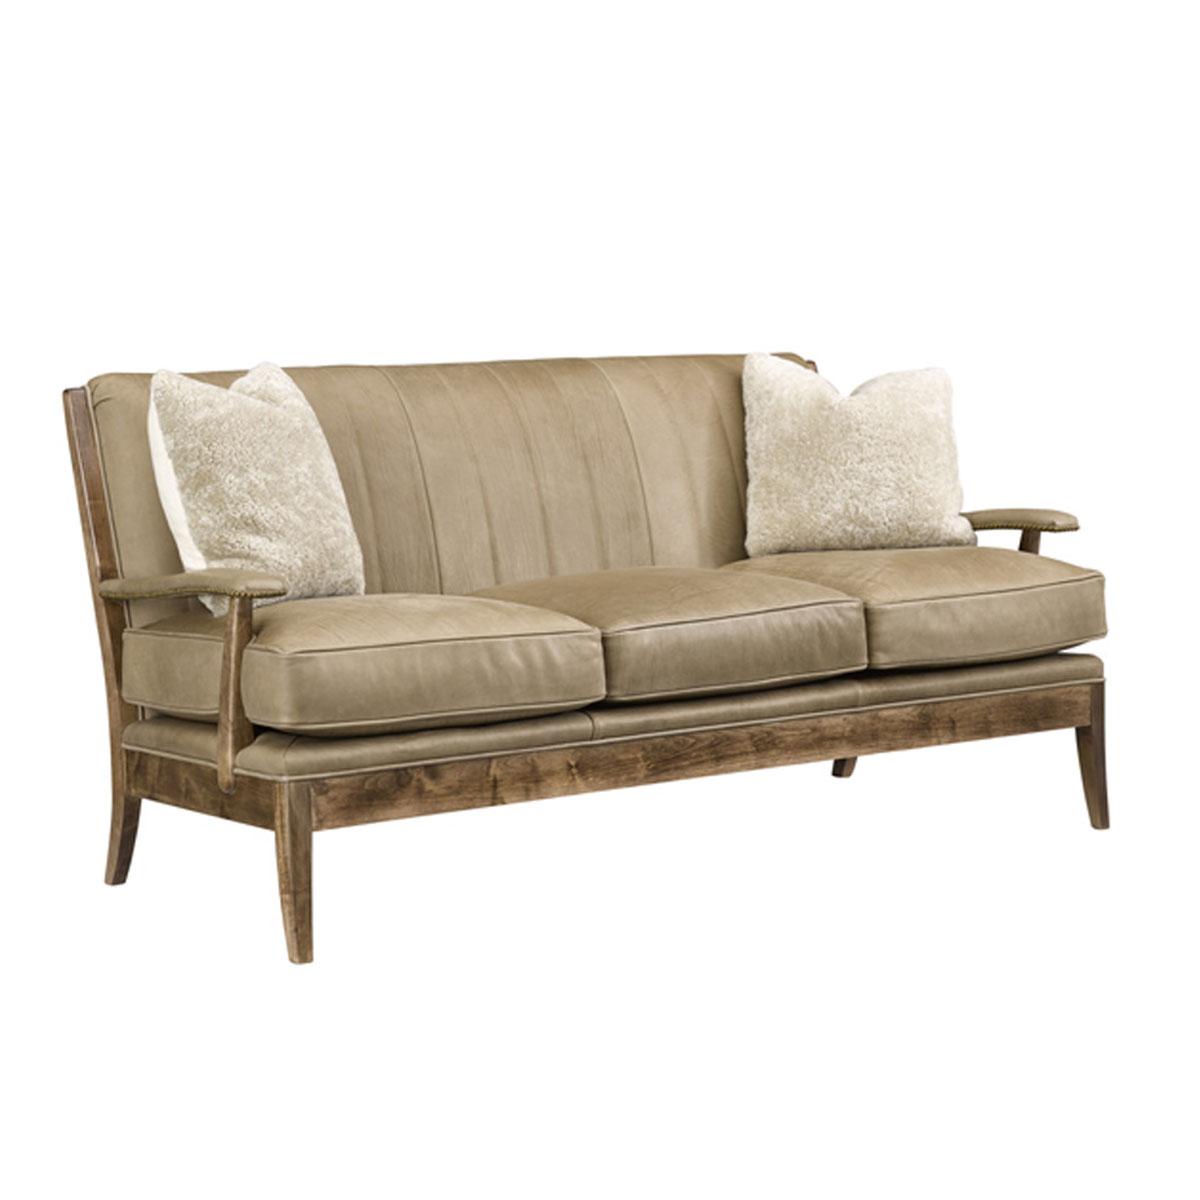 Pleasant Leathercraft Furniture Collection Ohio Hardwood Evergreenethics Interior Chair Design Evergreenethicsorg